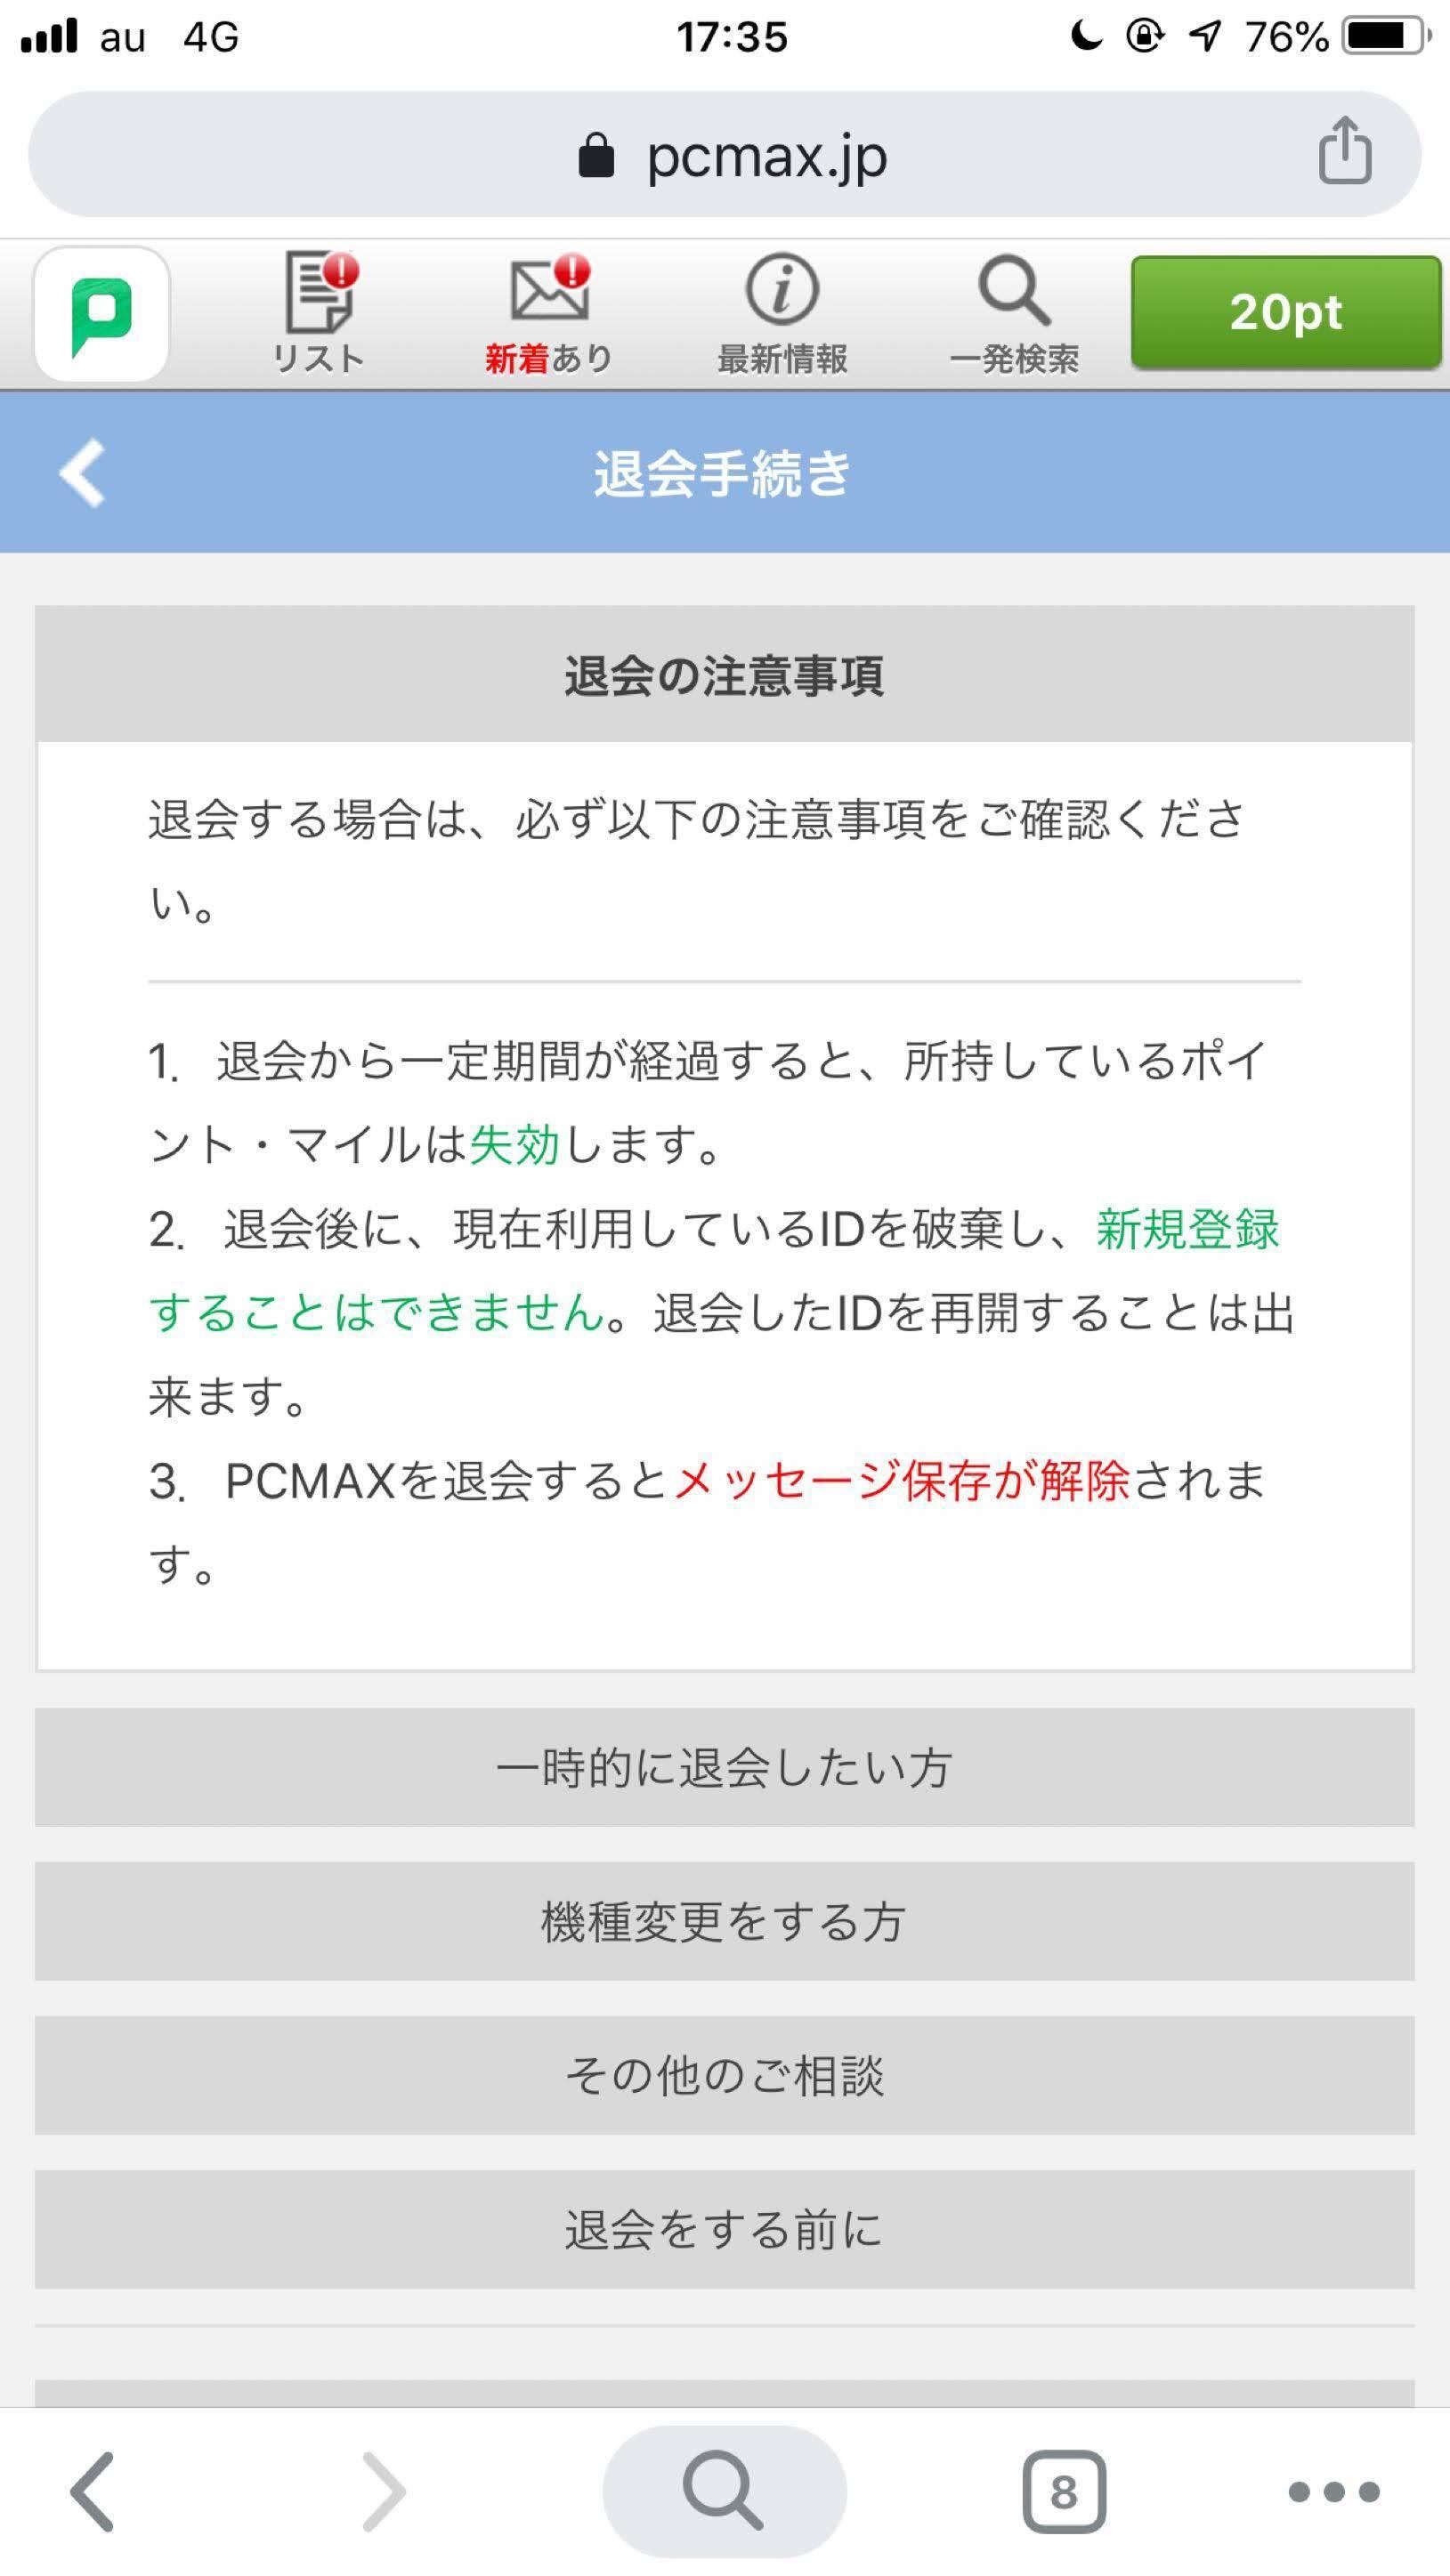 PC MAX(ピーシーマックス) 退会手続き画面一番下の「退会手続きへ進む」をタップ